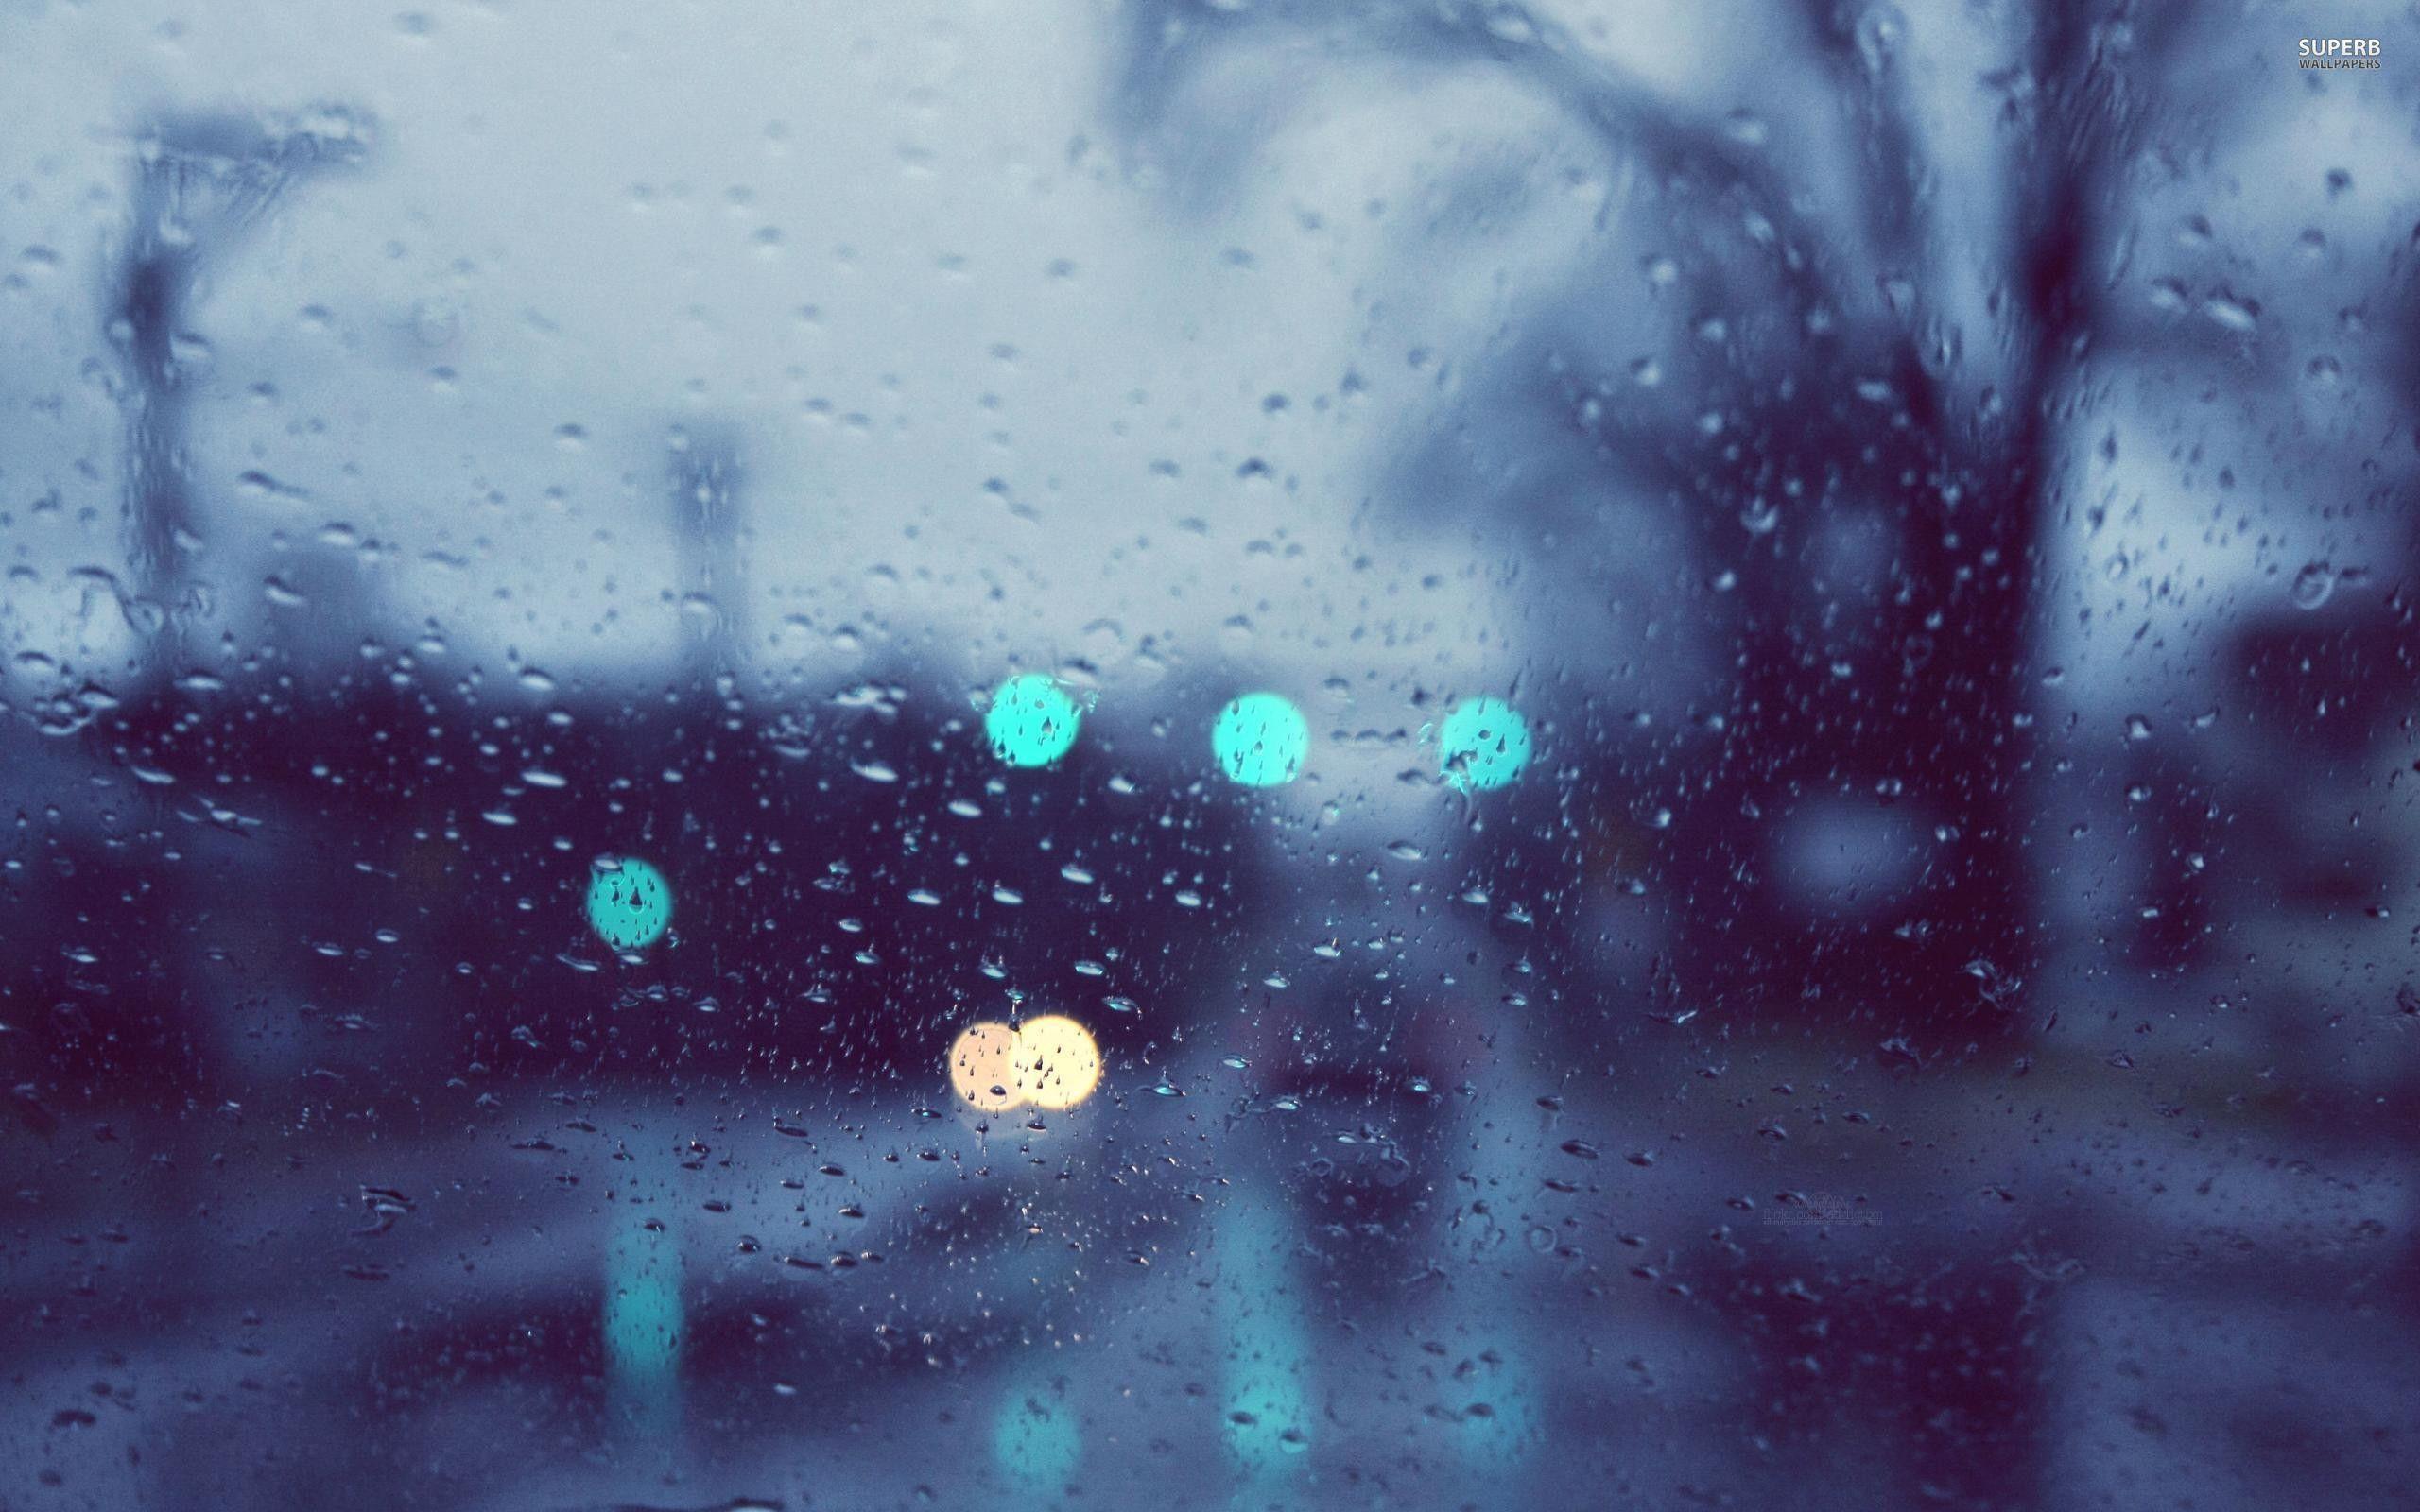 Aesthetic Rain Wallpapers - Top Free